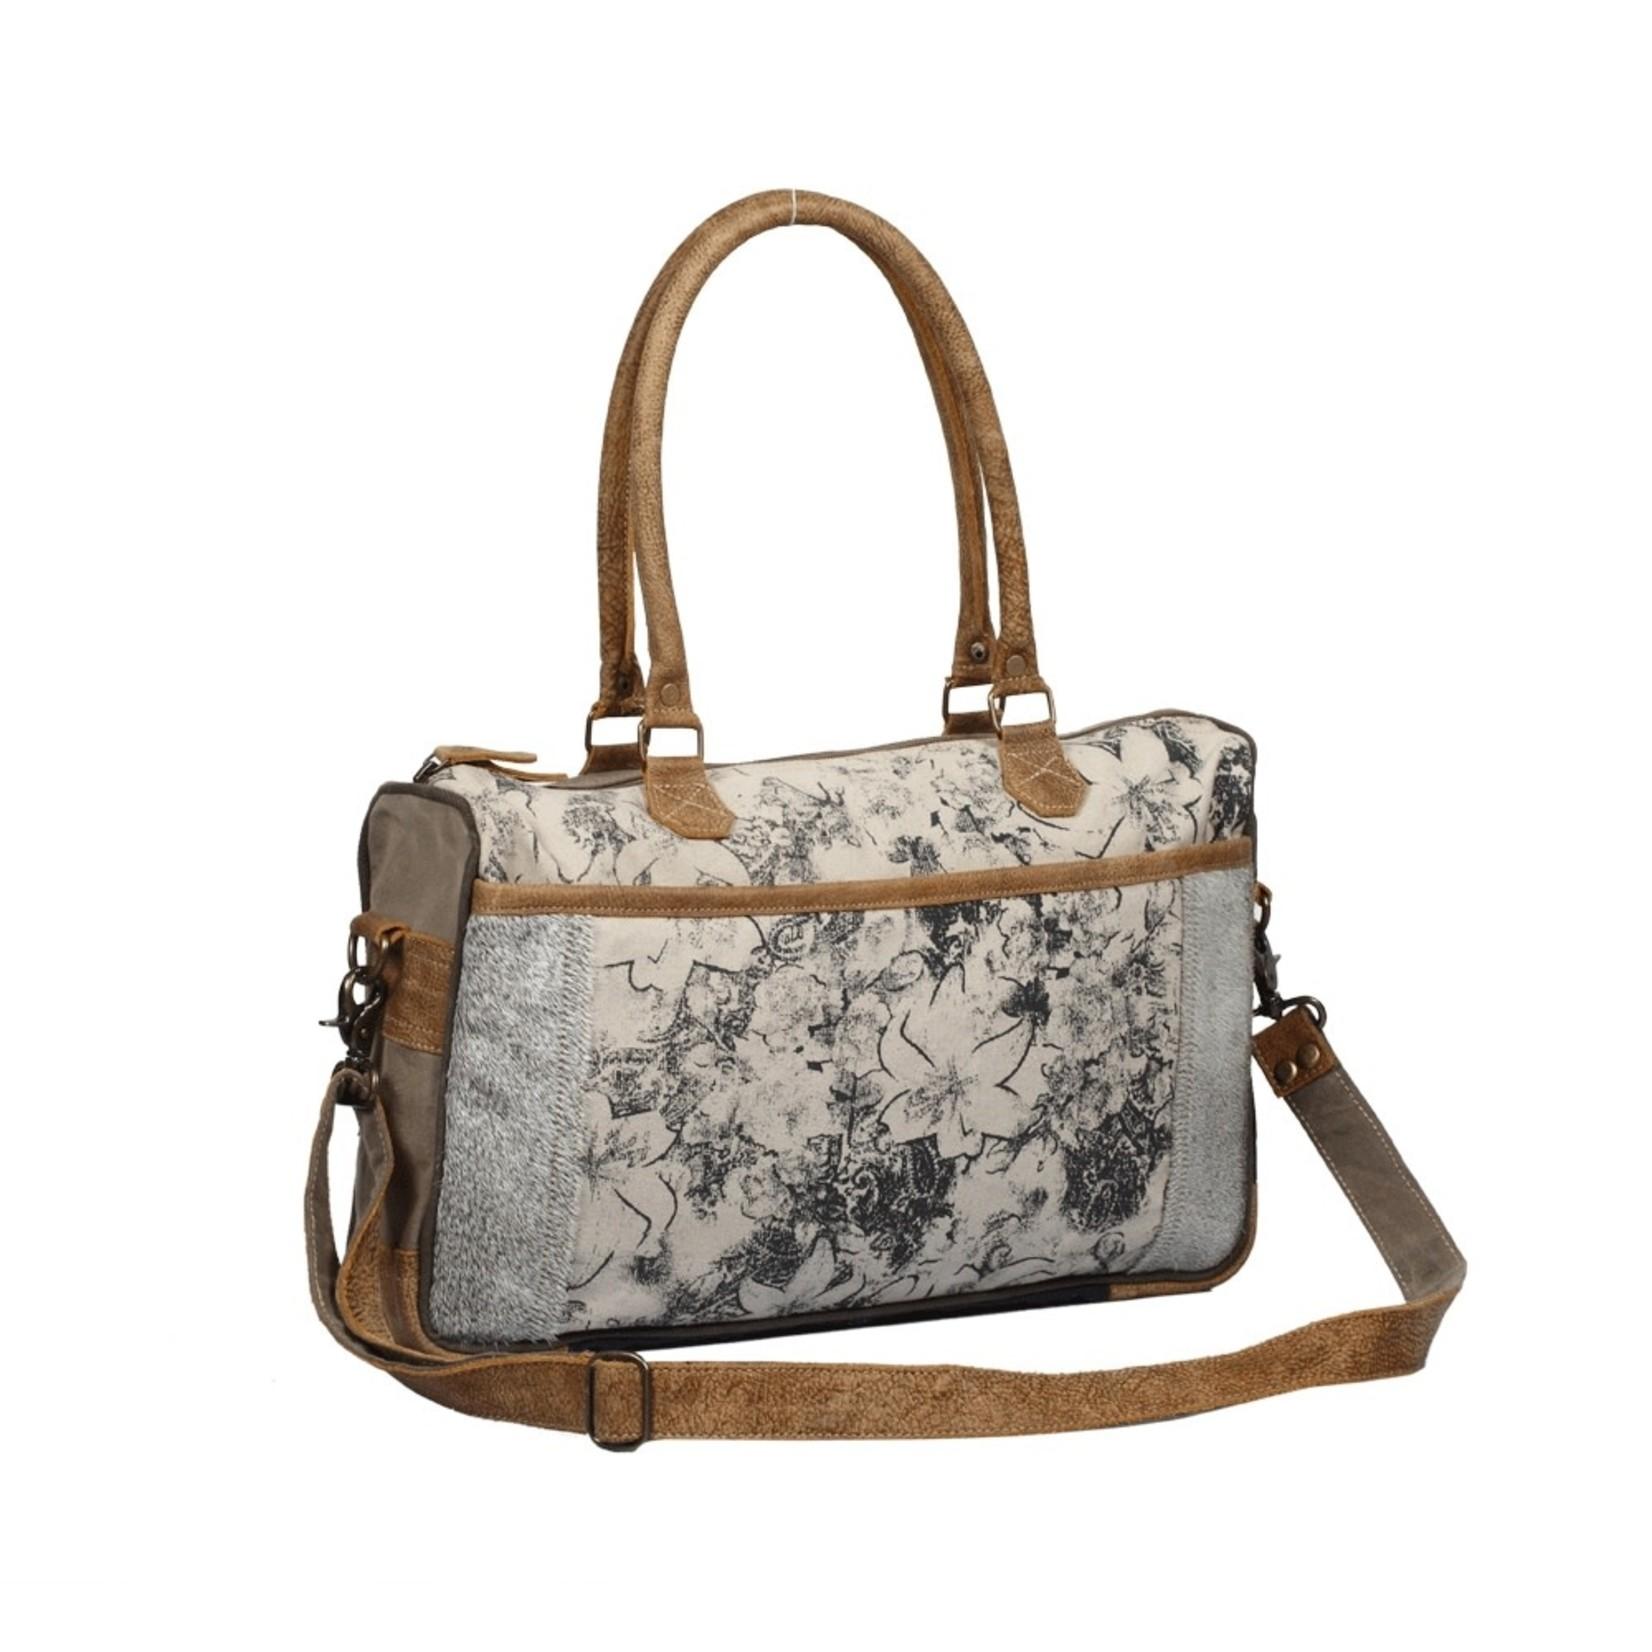 Myra Bags S-1292 Lanyard Messenger Bag